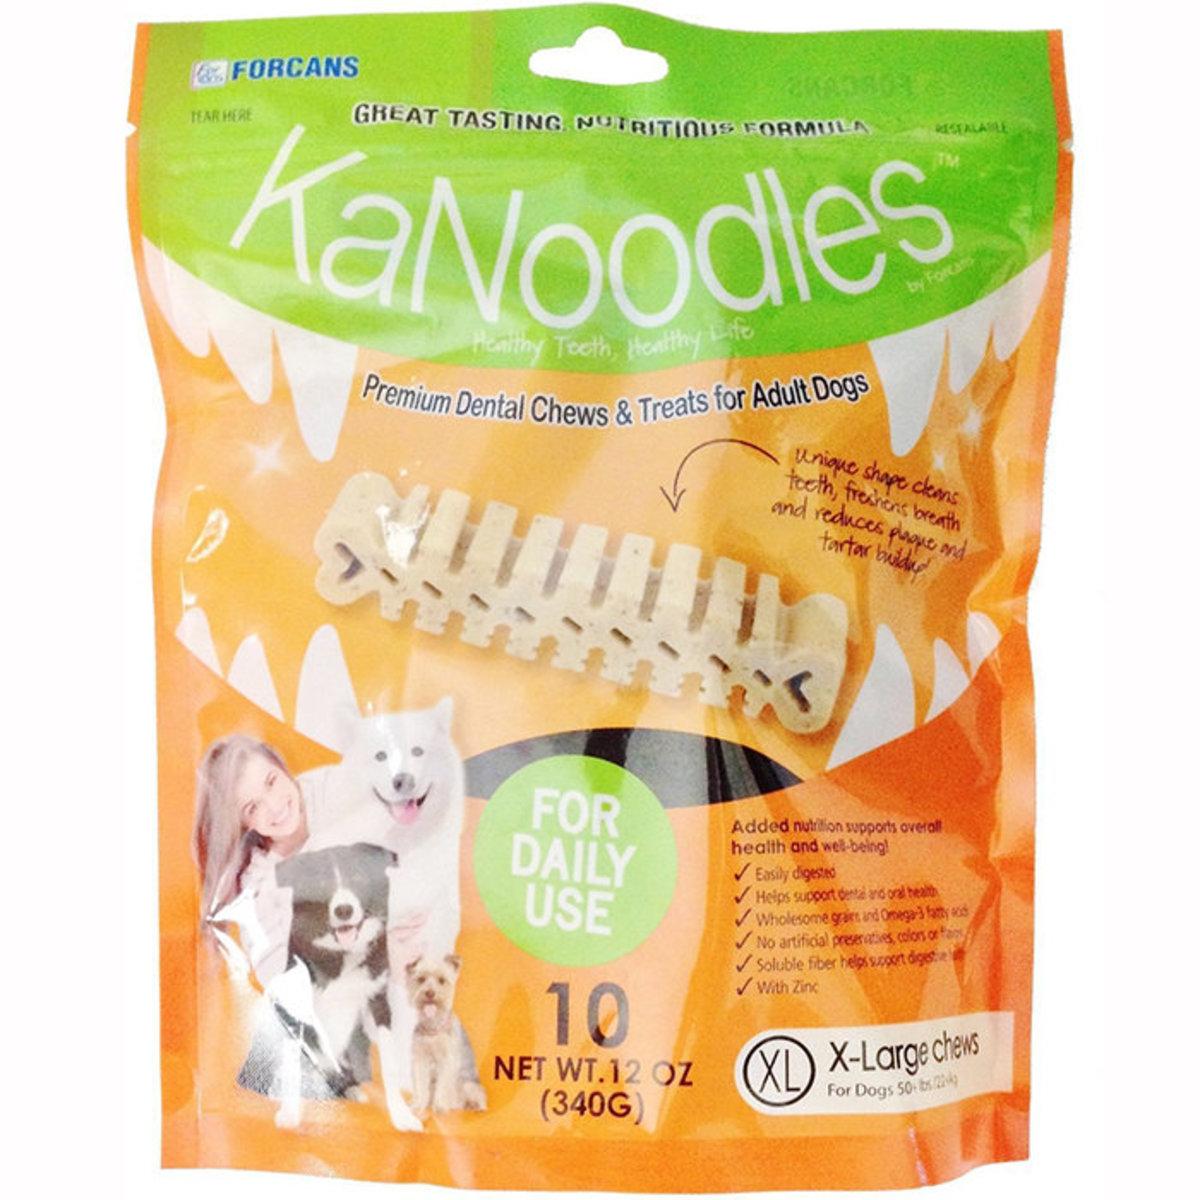 KaNoodles Premium Dental Chews & Treats for Adult Dogs XL 12oz 10pcs